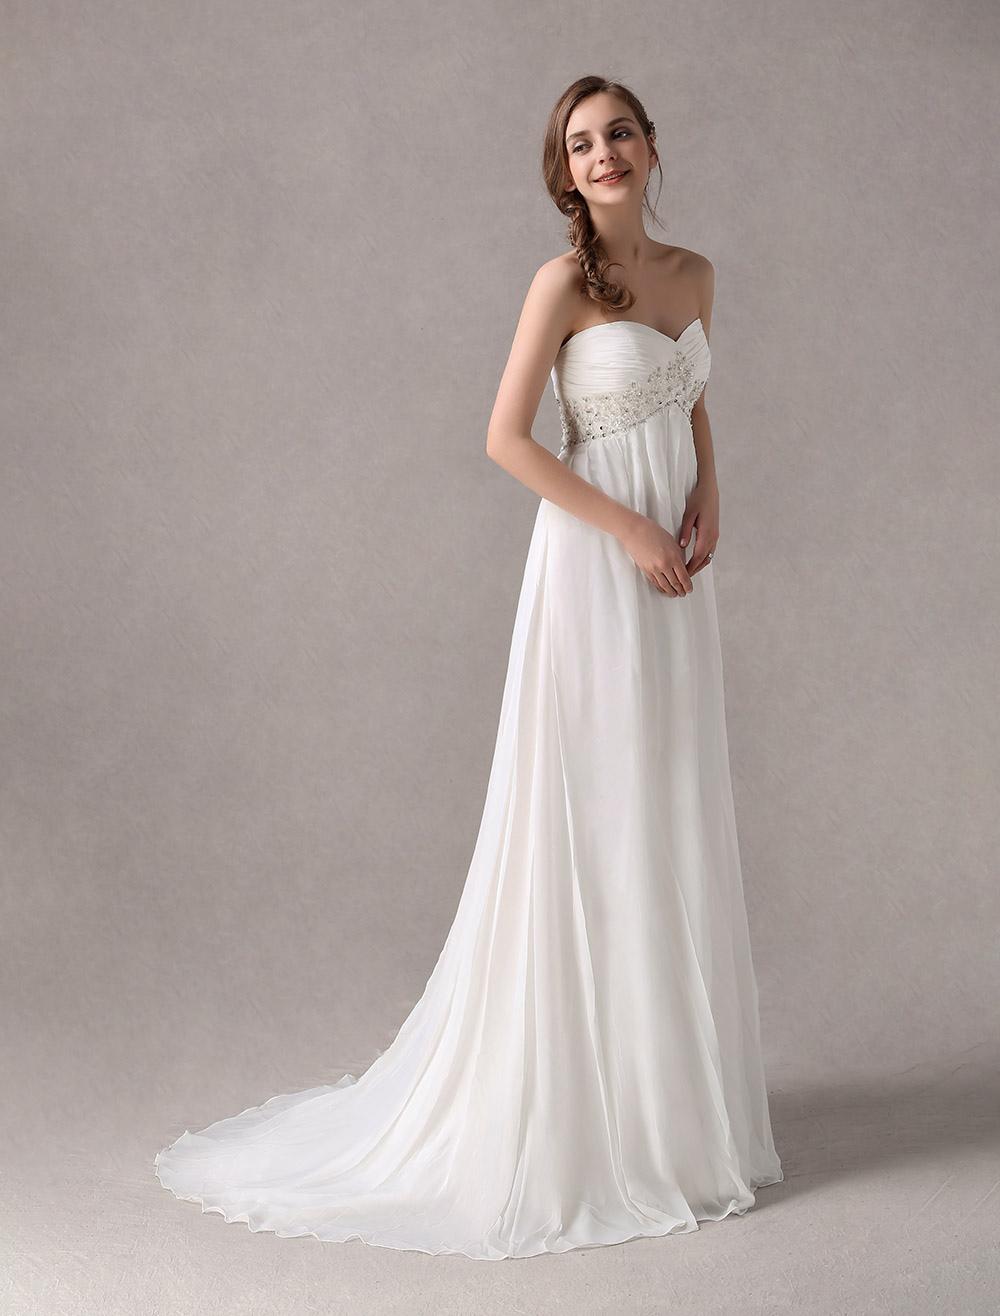 Sweep Ivory Chiffon Wedding Dress with Empire Waist - Milanoo.com